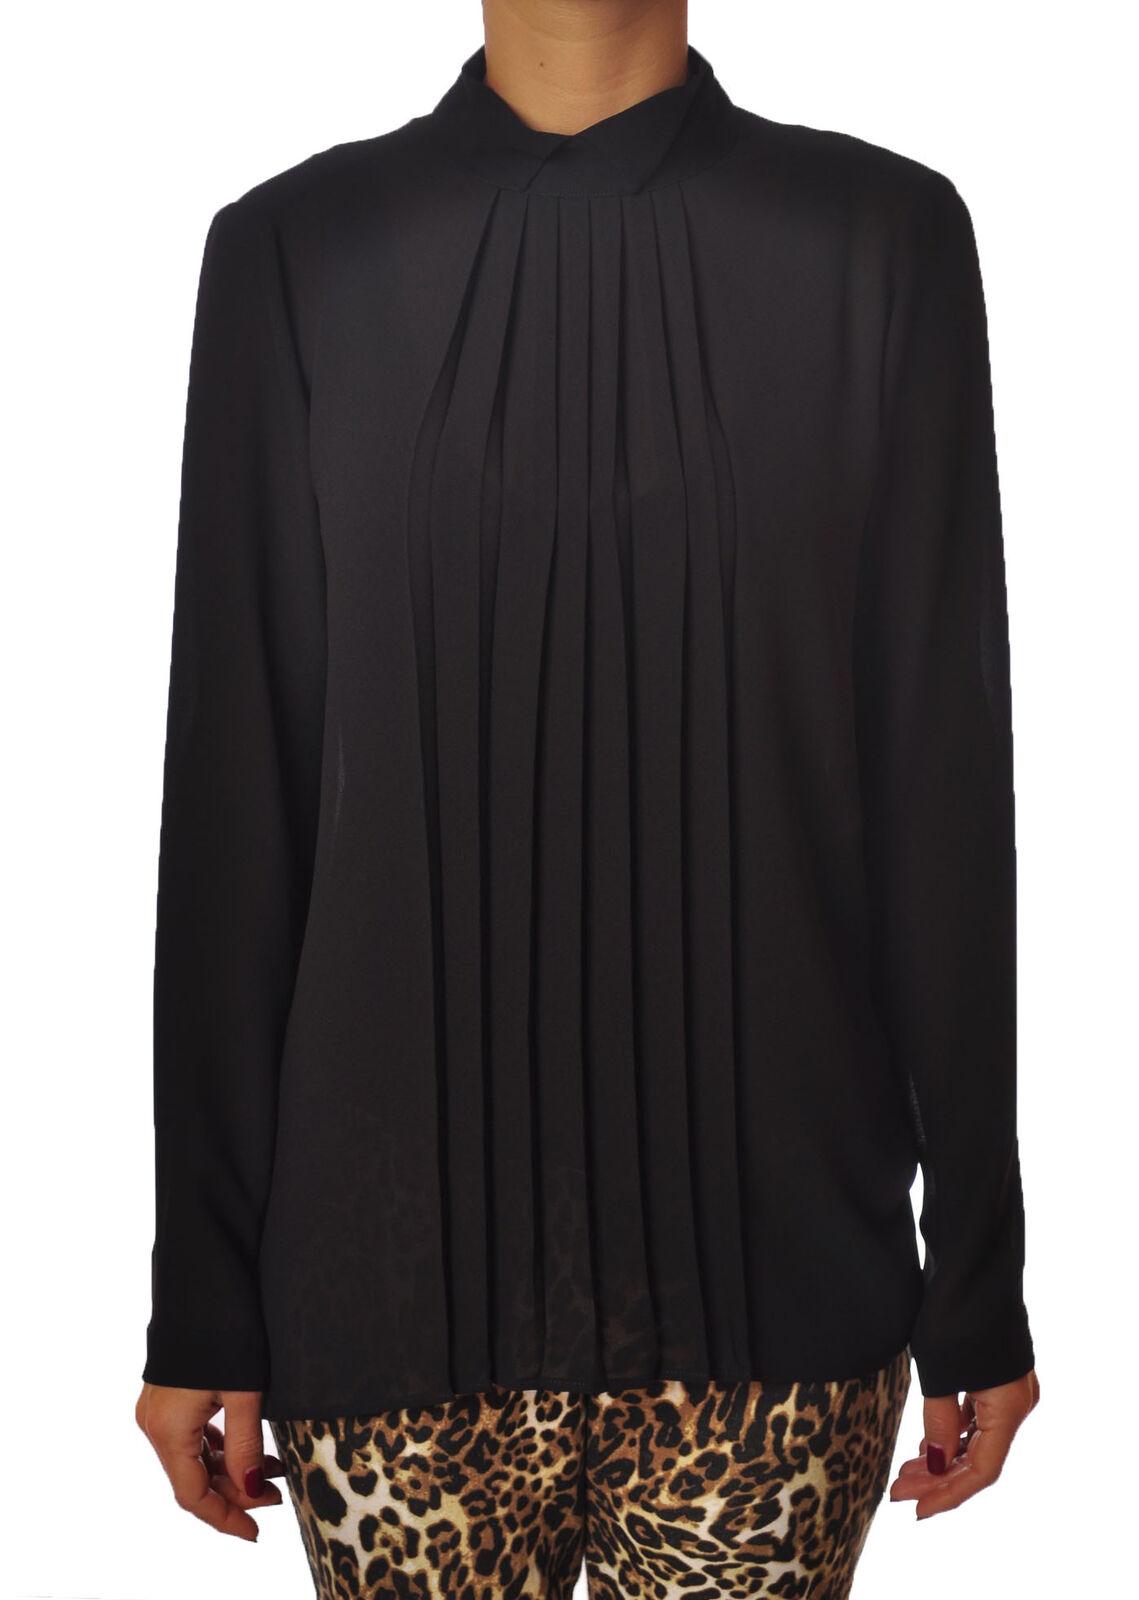 Rame - Shirts-Shirt - Woman - schwarz - 4406304M184305